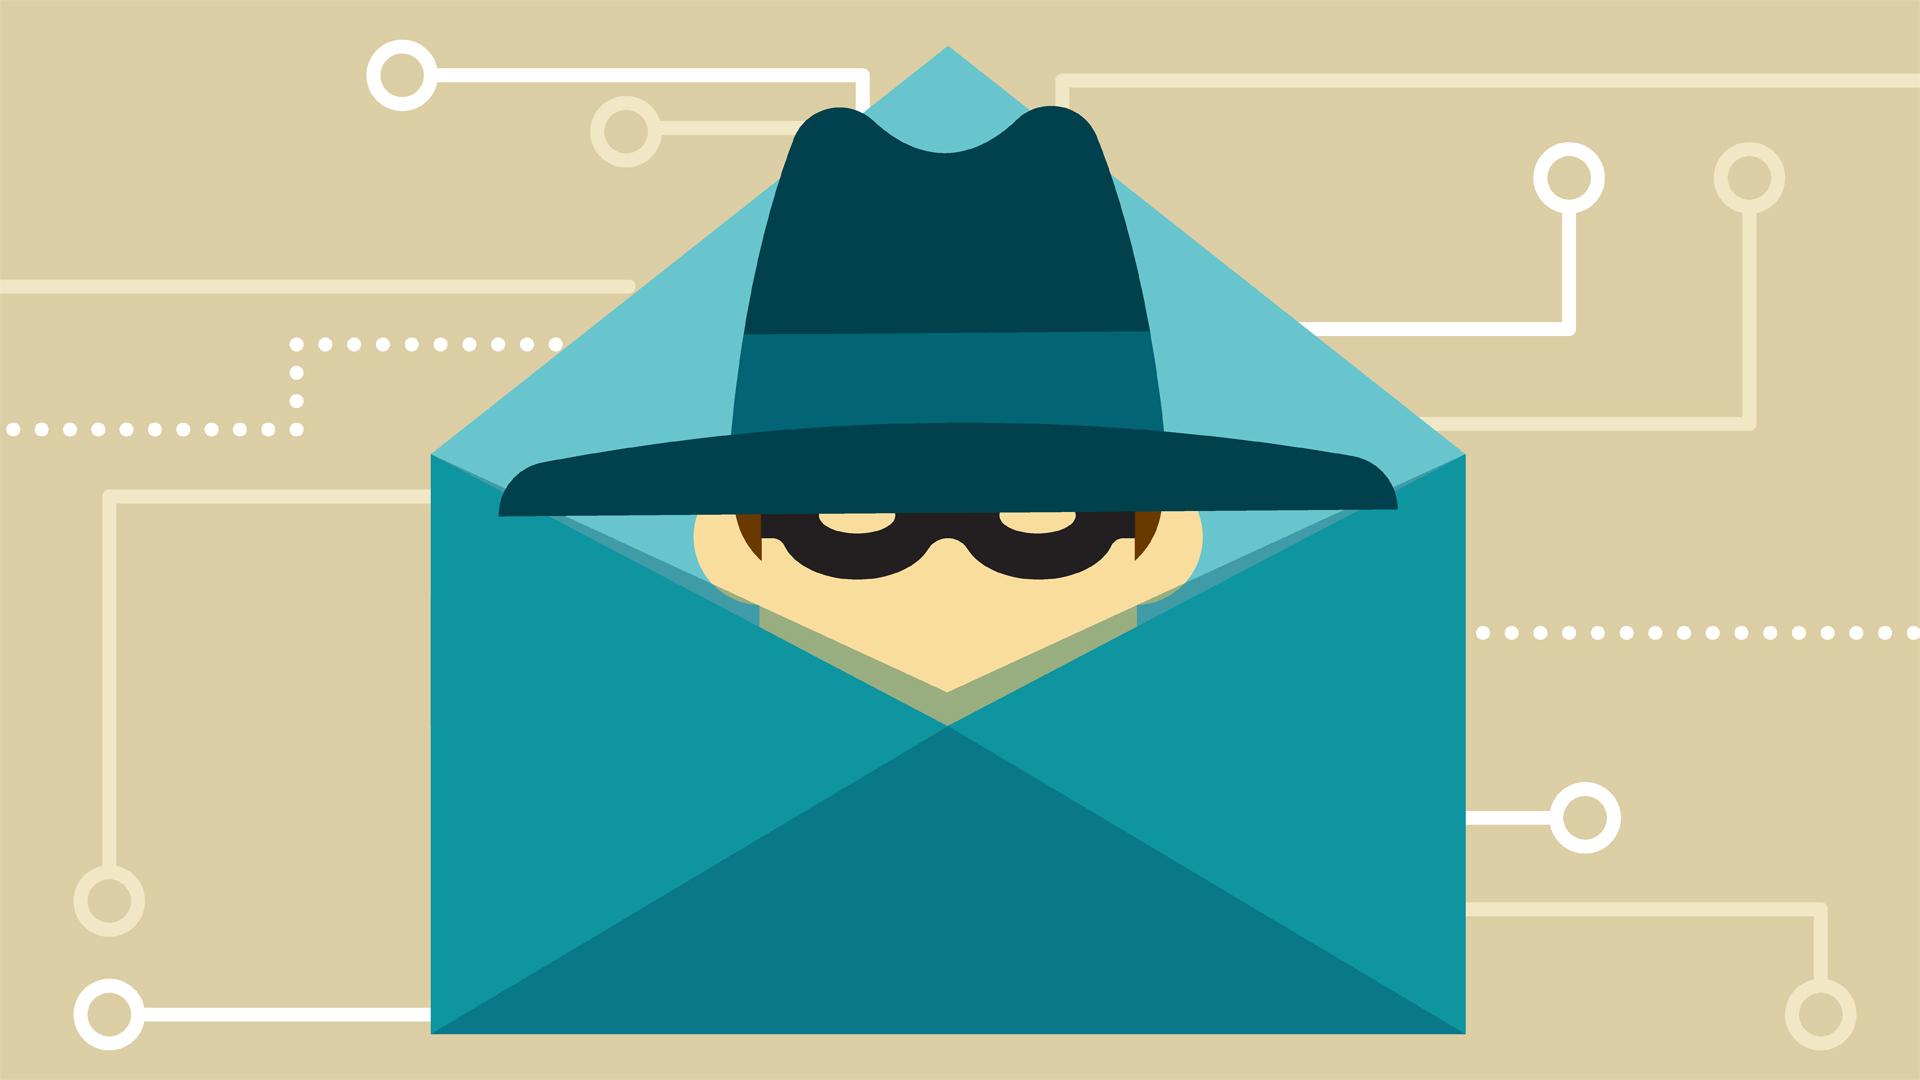 malware ransomware sicurezza check point software technologies hacker criptovaluta